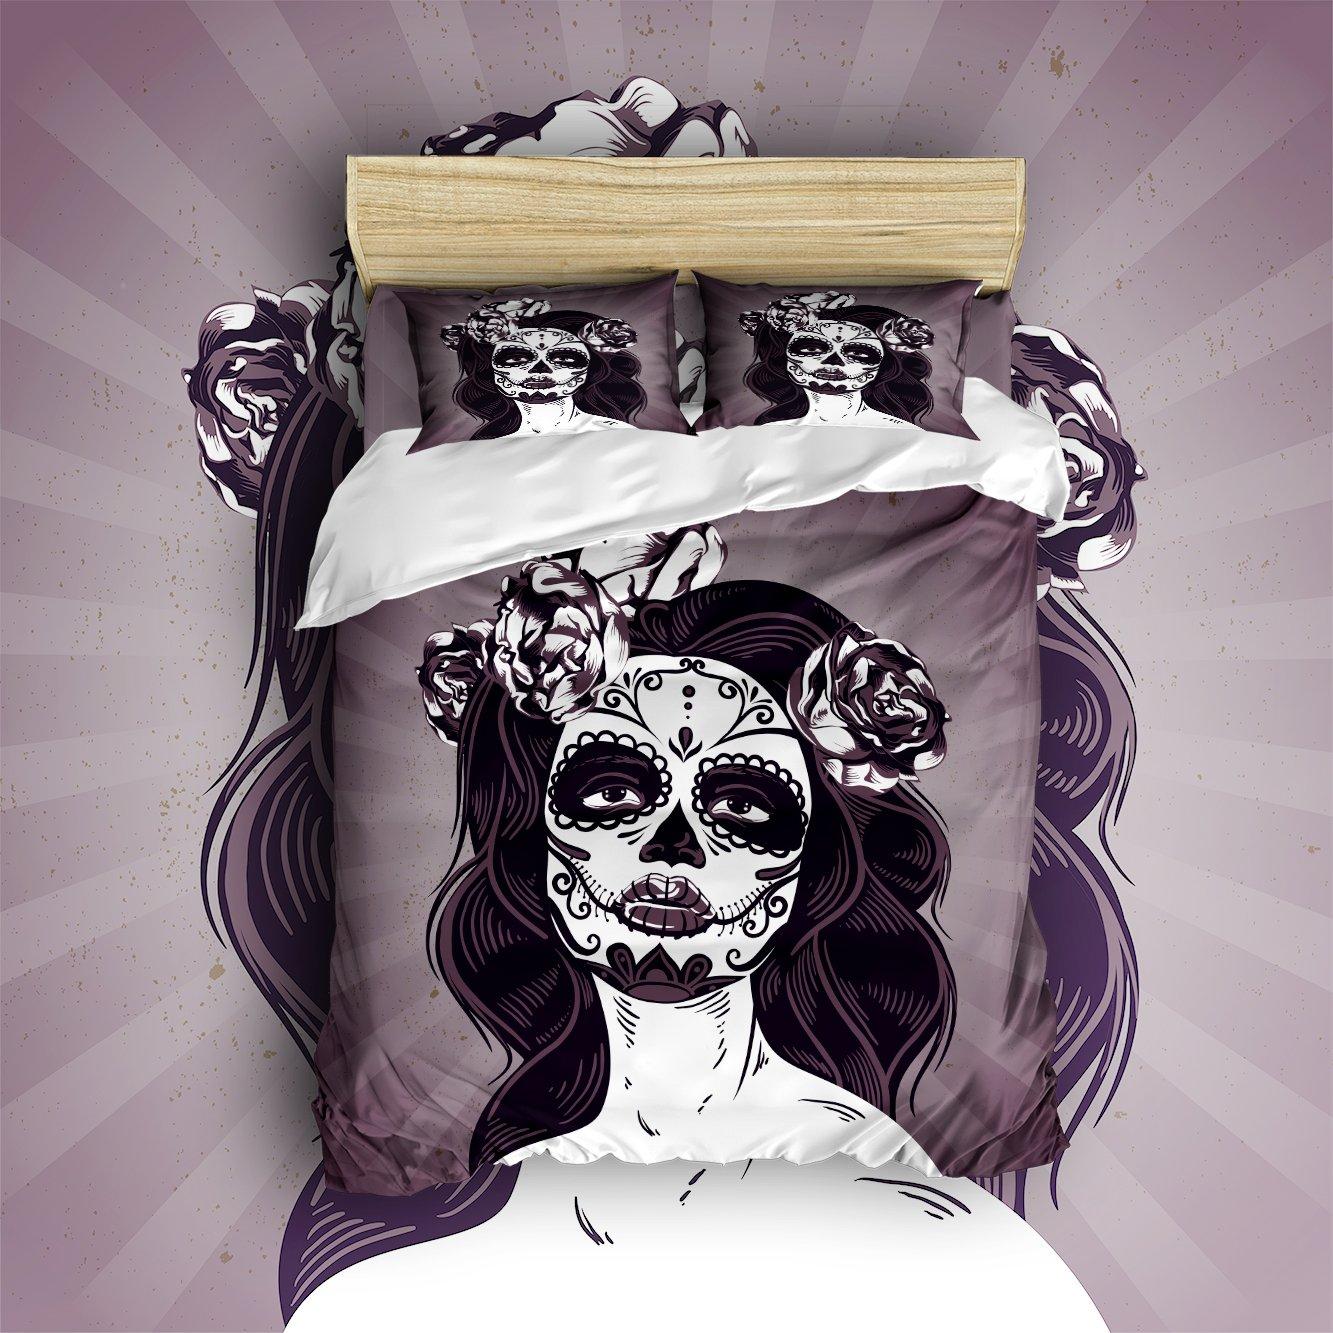 Beauty Decor Bedding 4 Piece bed Set Duvet Cover,cartelina skull 4 Piece Bed Sheet Set 1 Flat Sheet 1 Fitted Sheet and 9 Pillow Cases